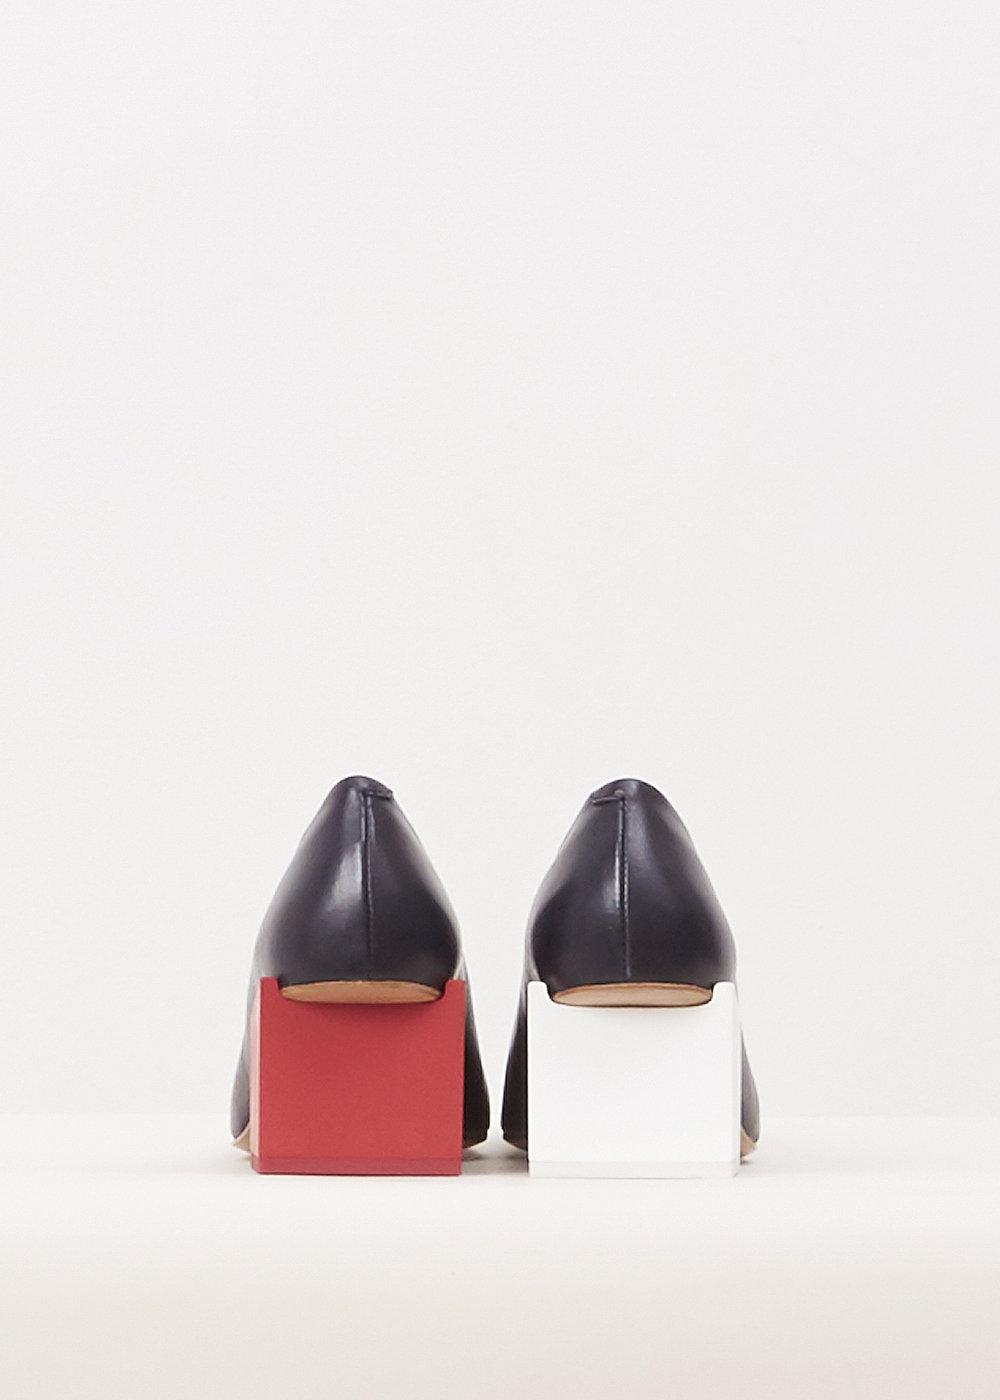 Jacquemus Navy Les Chaussures Arlequin $535